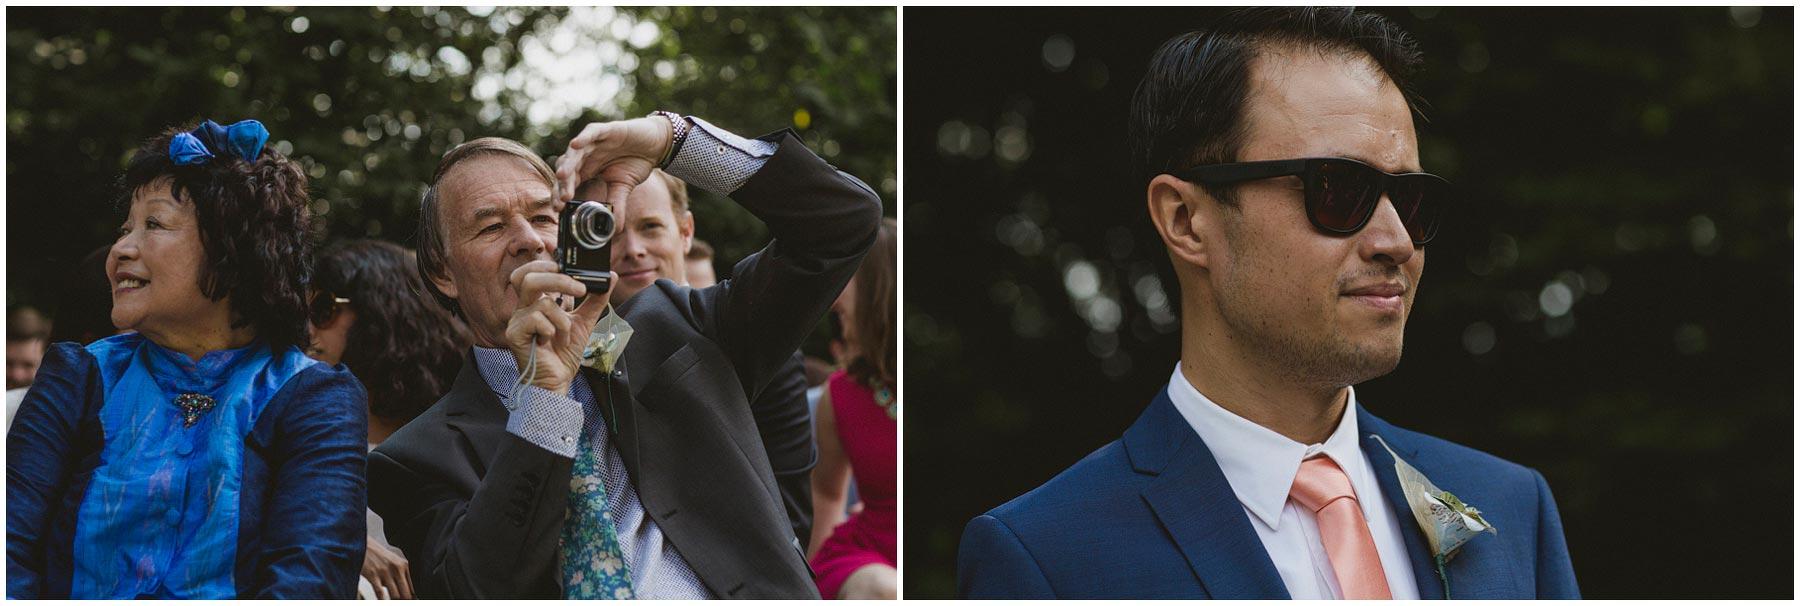 Colehayes-Park-Wedding-Photography_0054